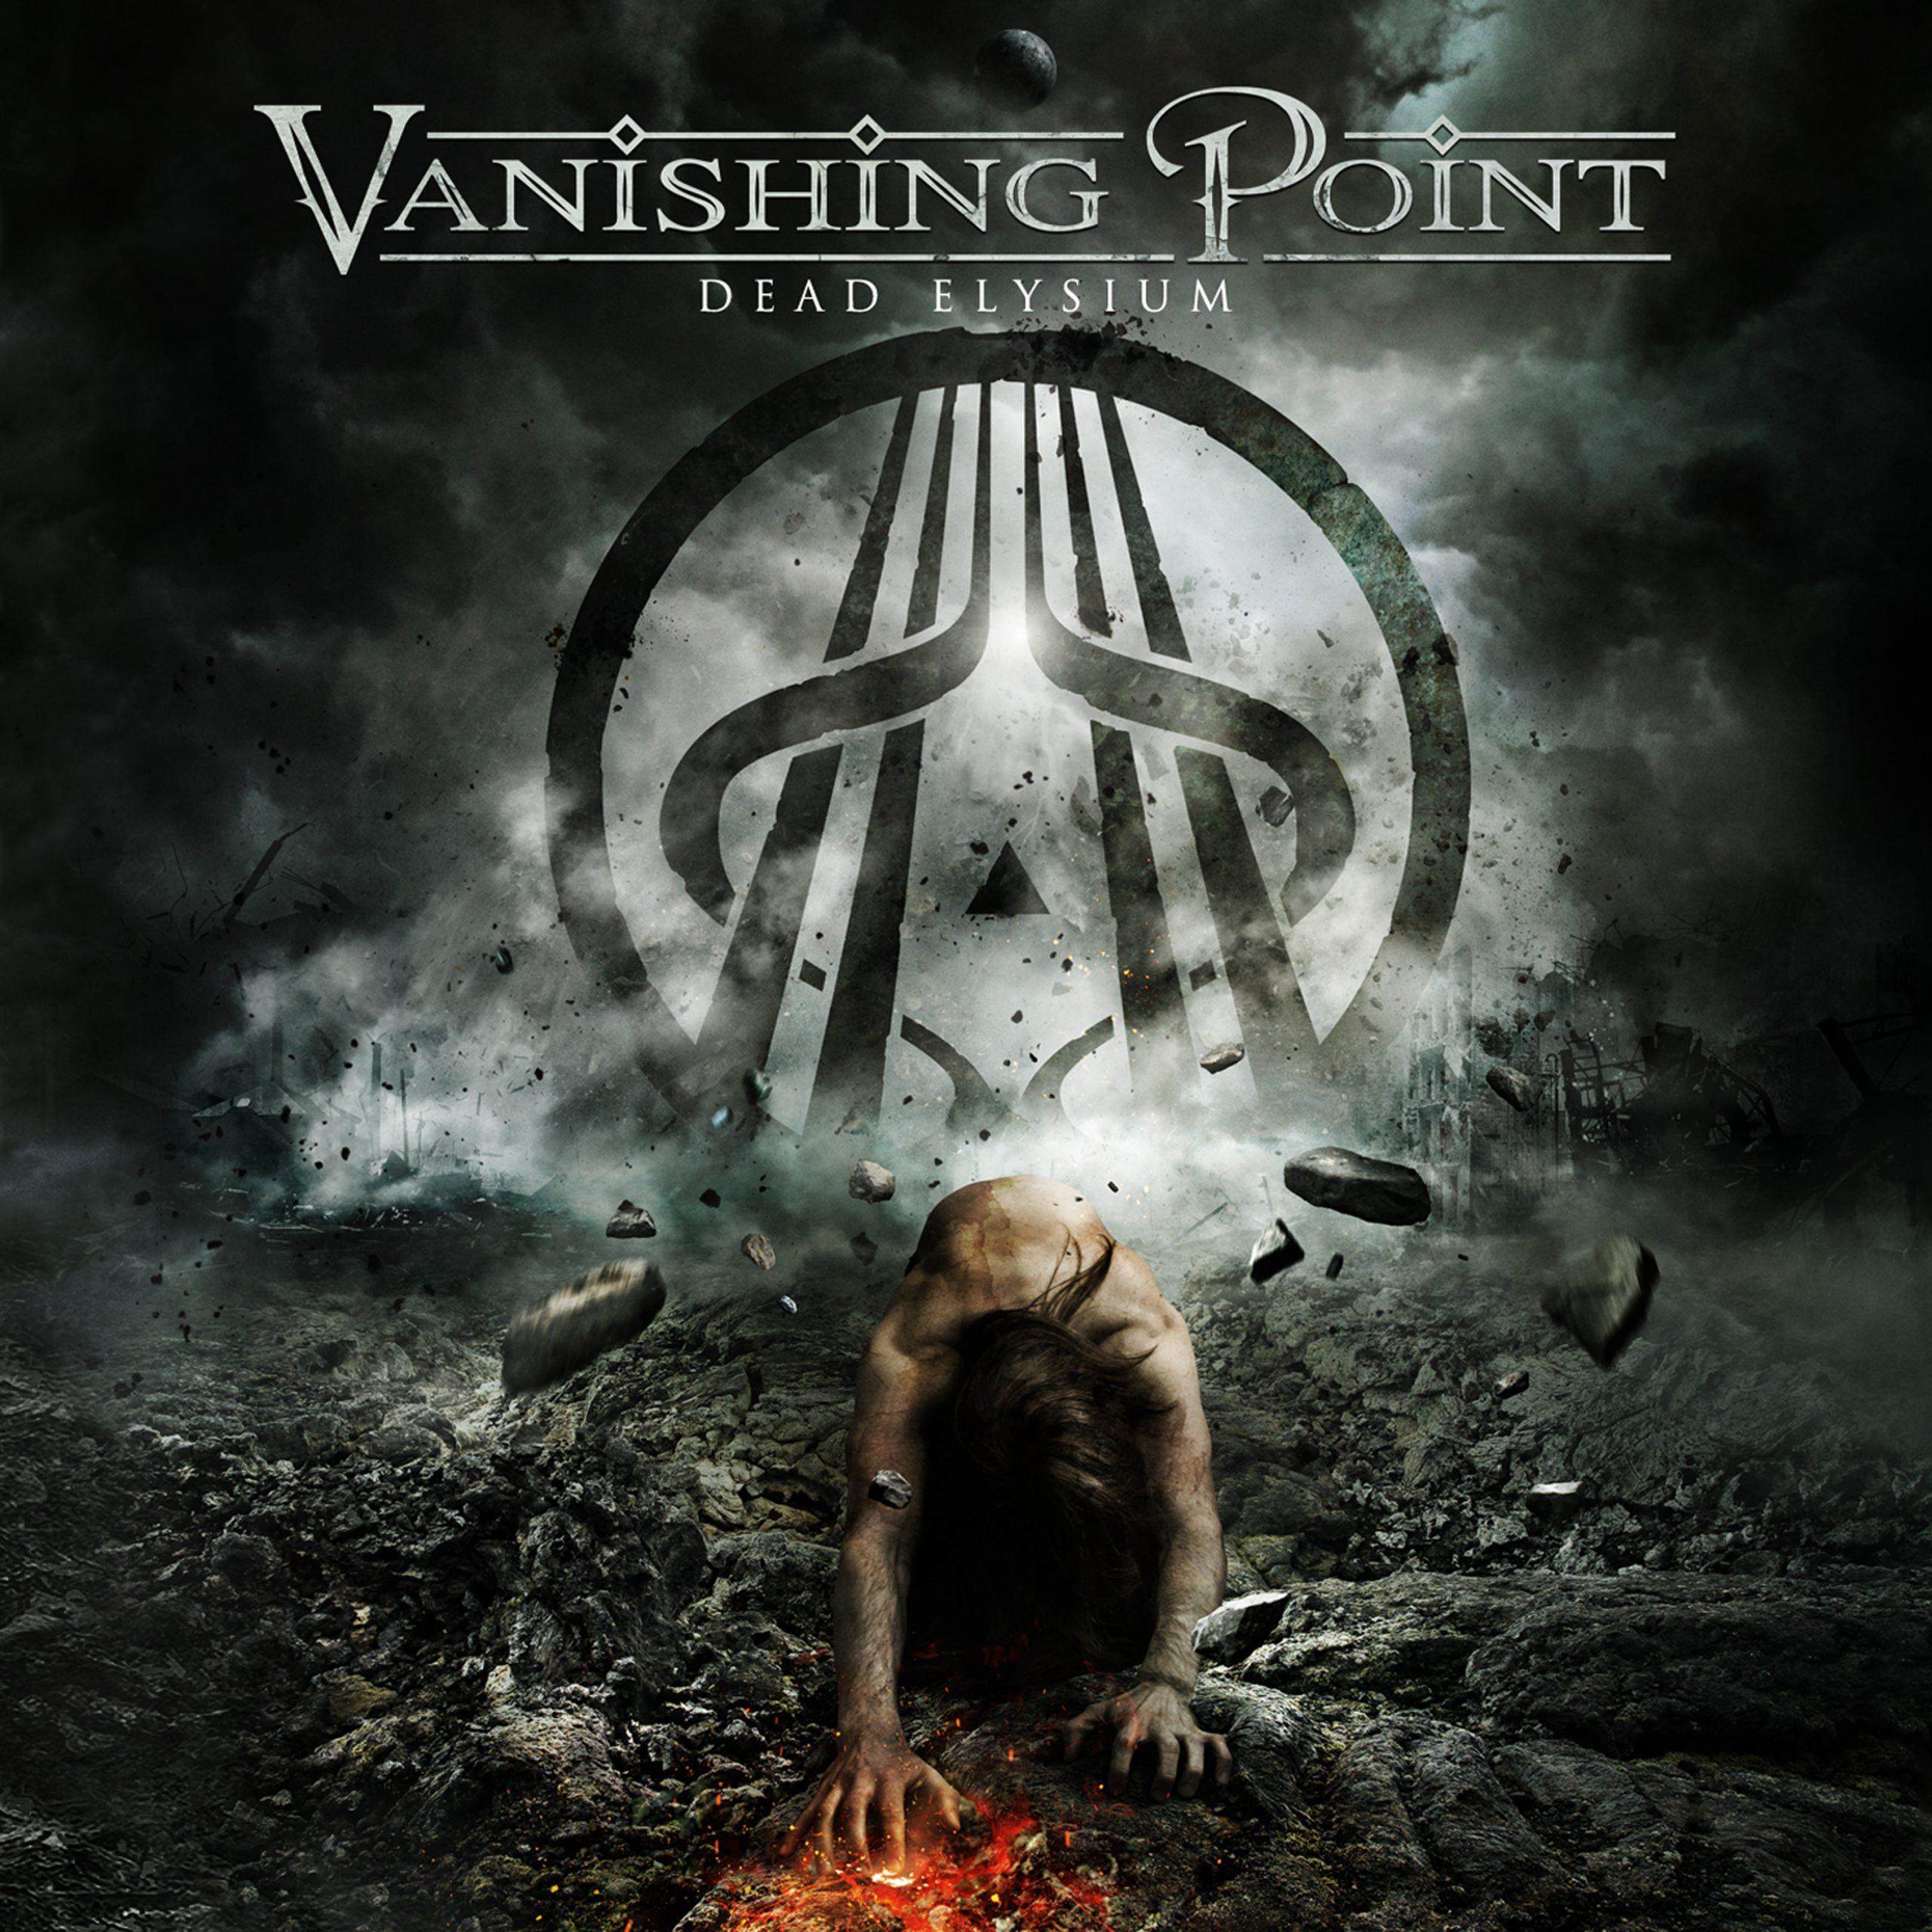 vanishing-point-neues-synphonic-power-metal-album-aus-down-under-dead-elysium